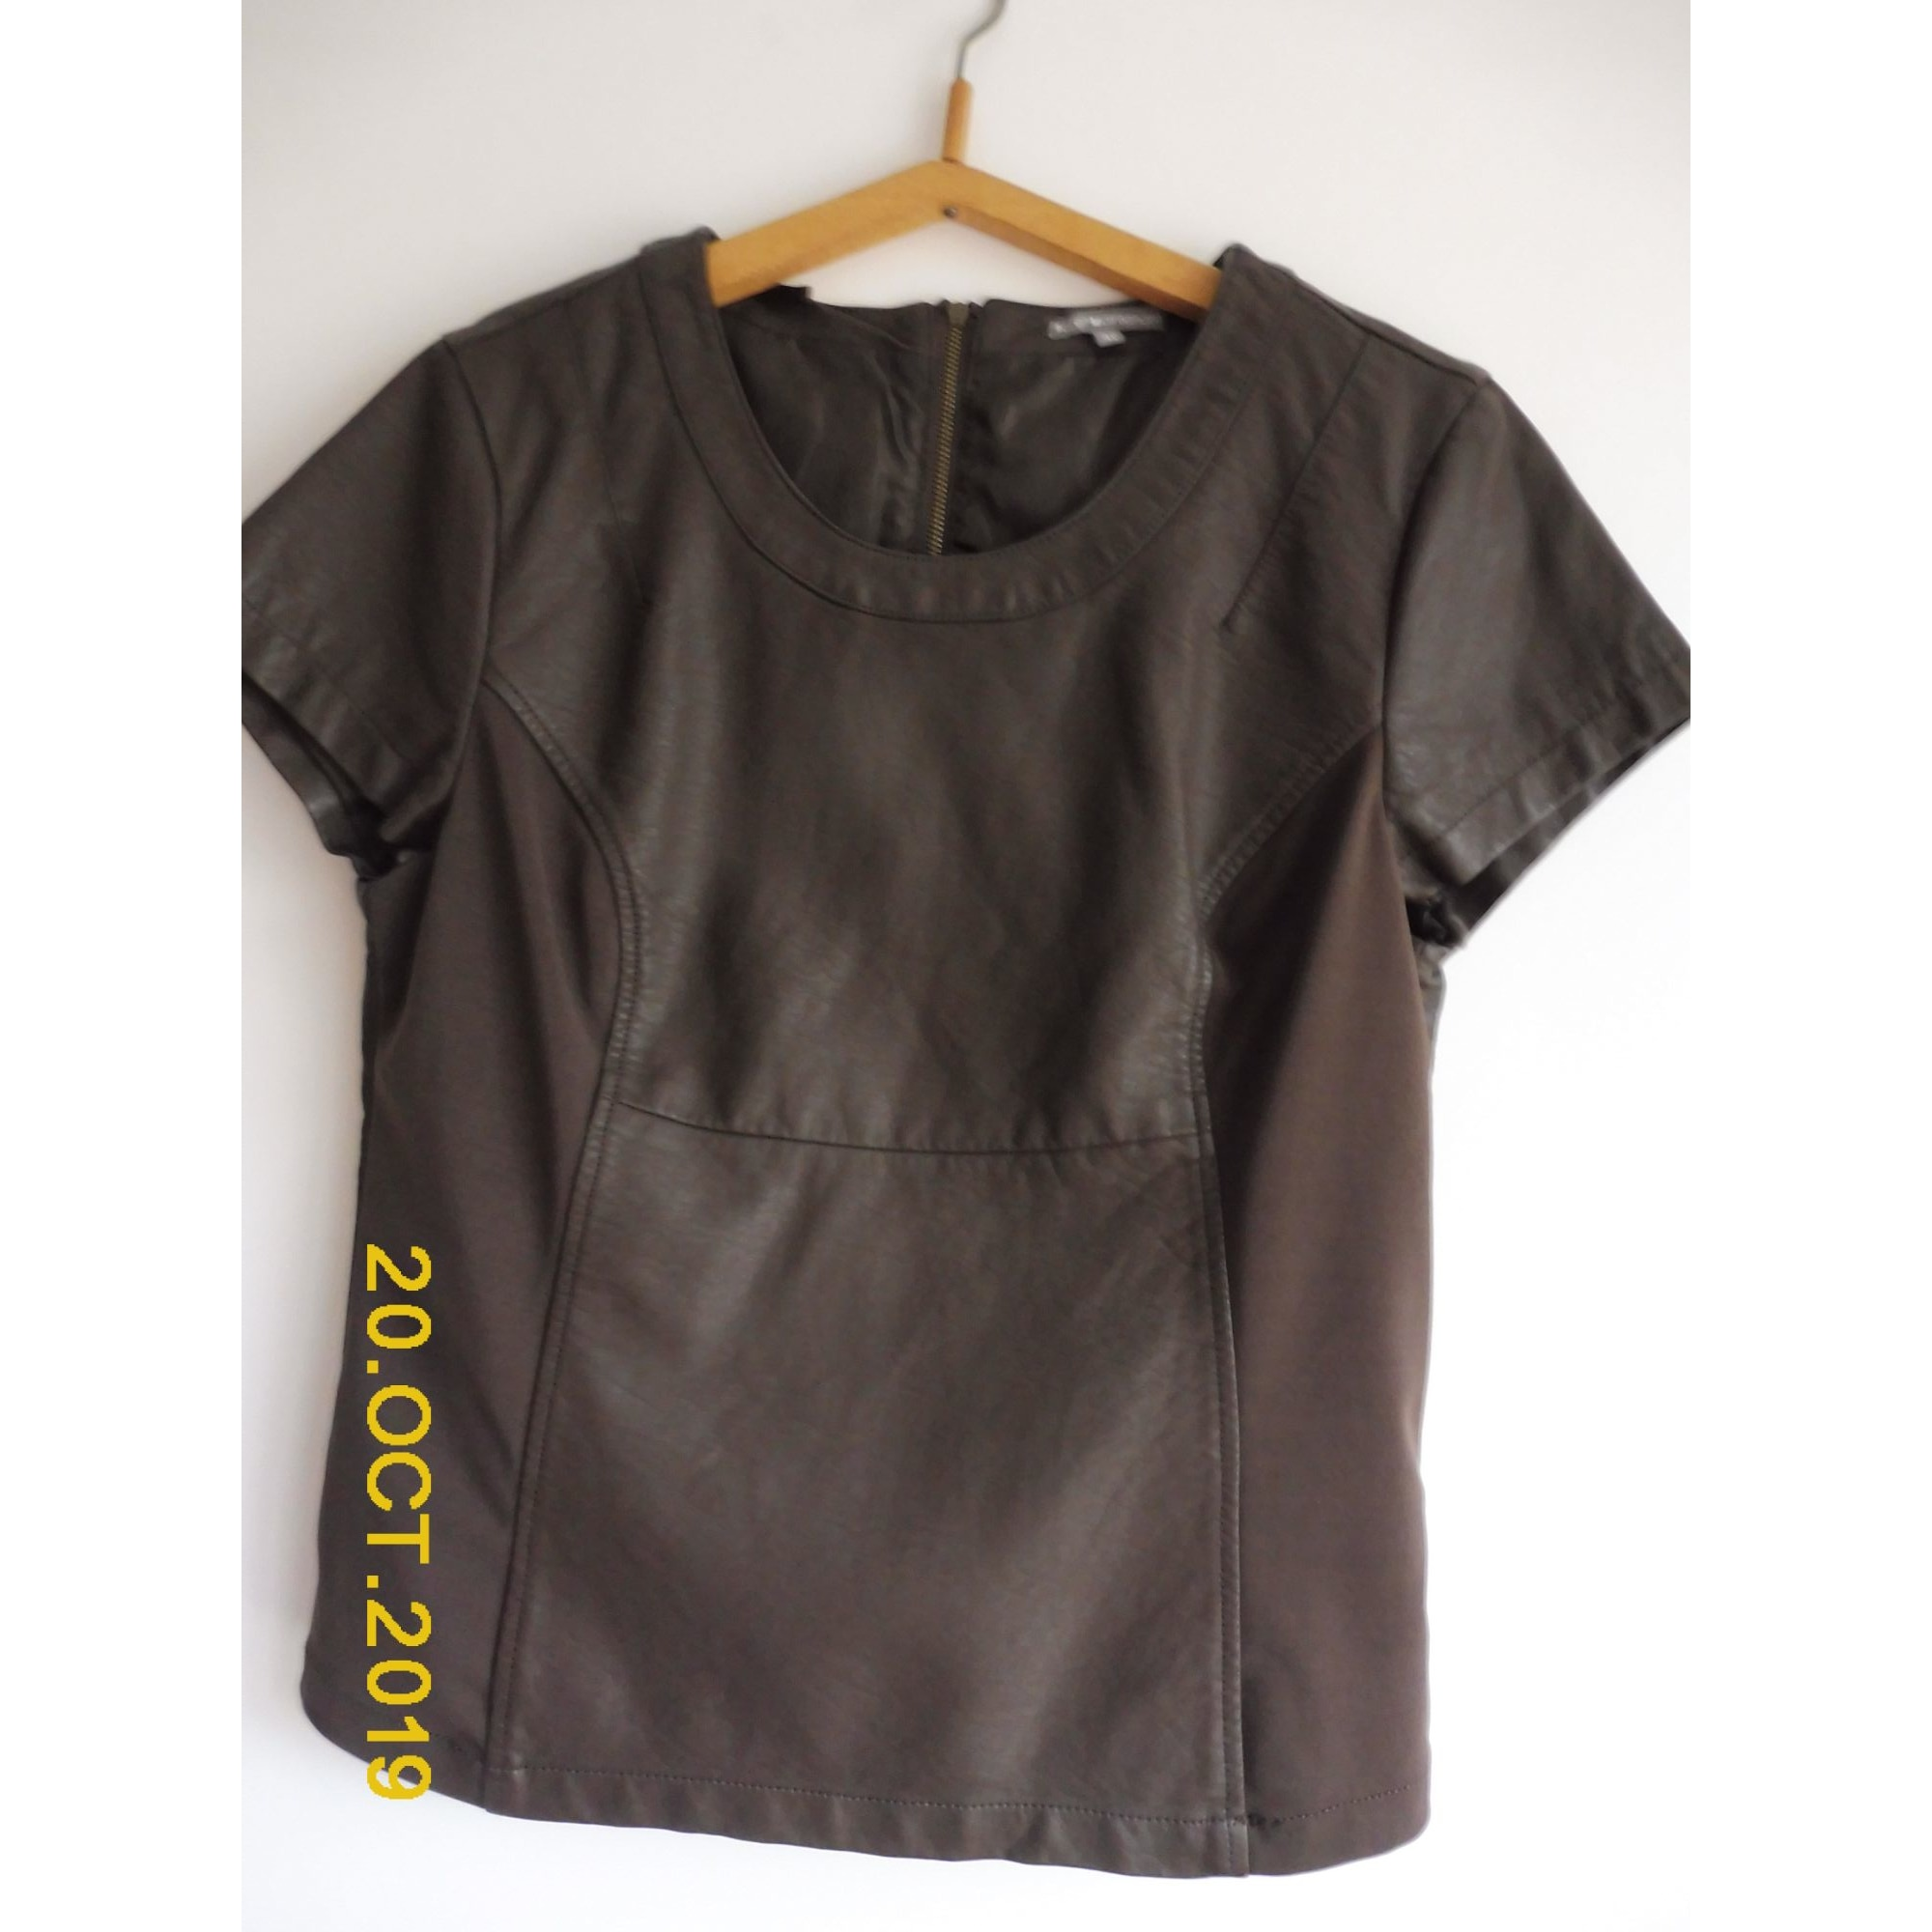 Top, tee-shirt ICI ET MAINTENANT Marron